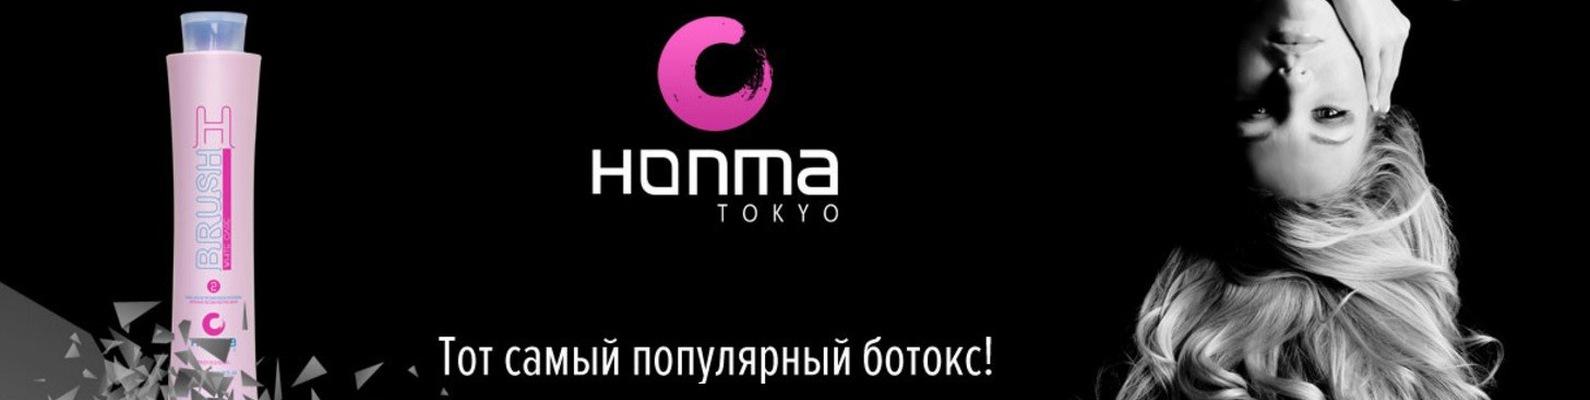 Honma tokyo ботокс беременным 27